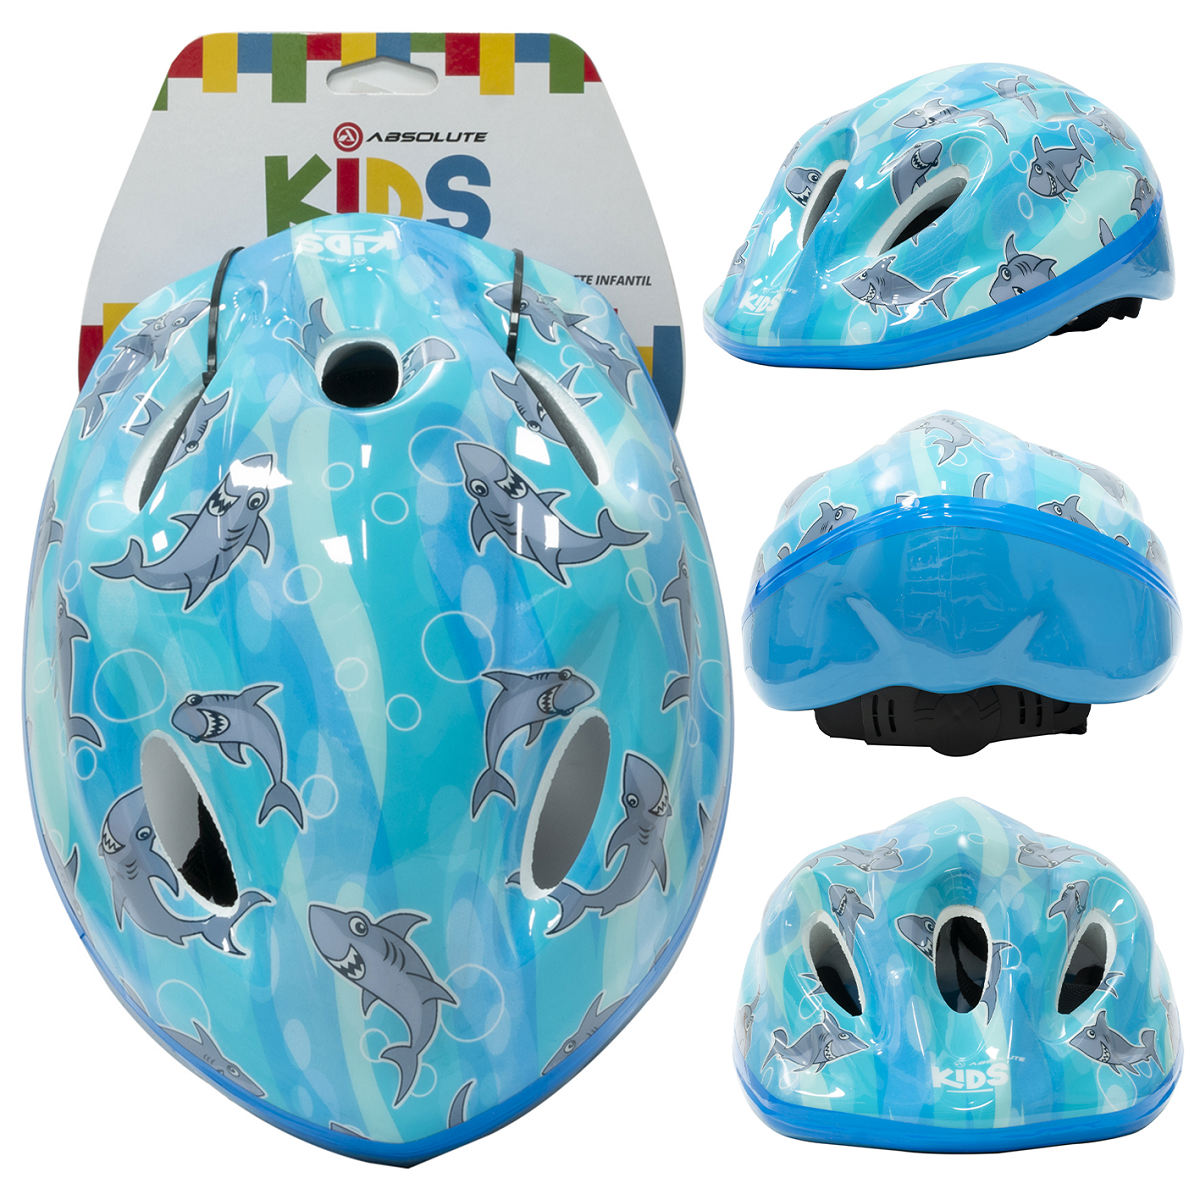 Capacete Infantil Absolute KIDS SHAKE - Azul Tubarão